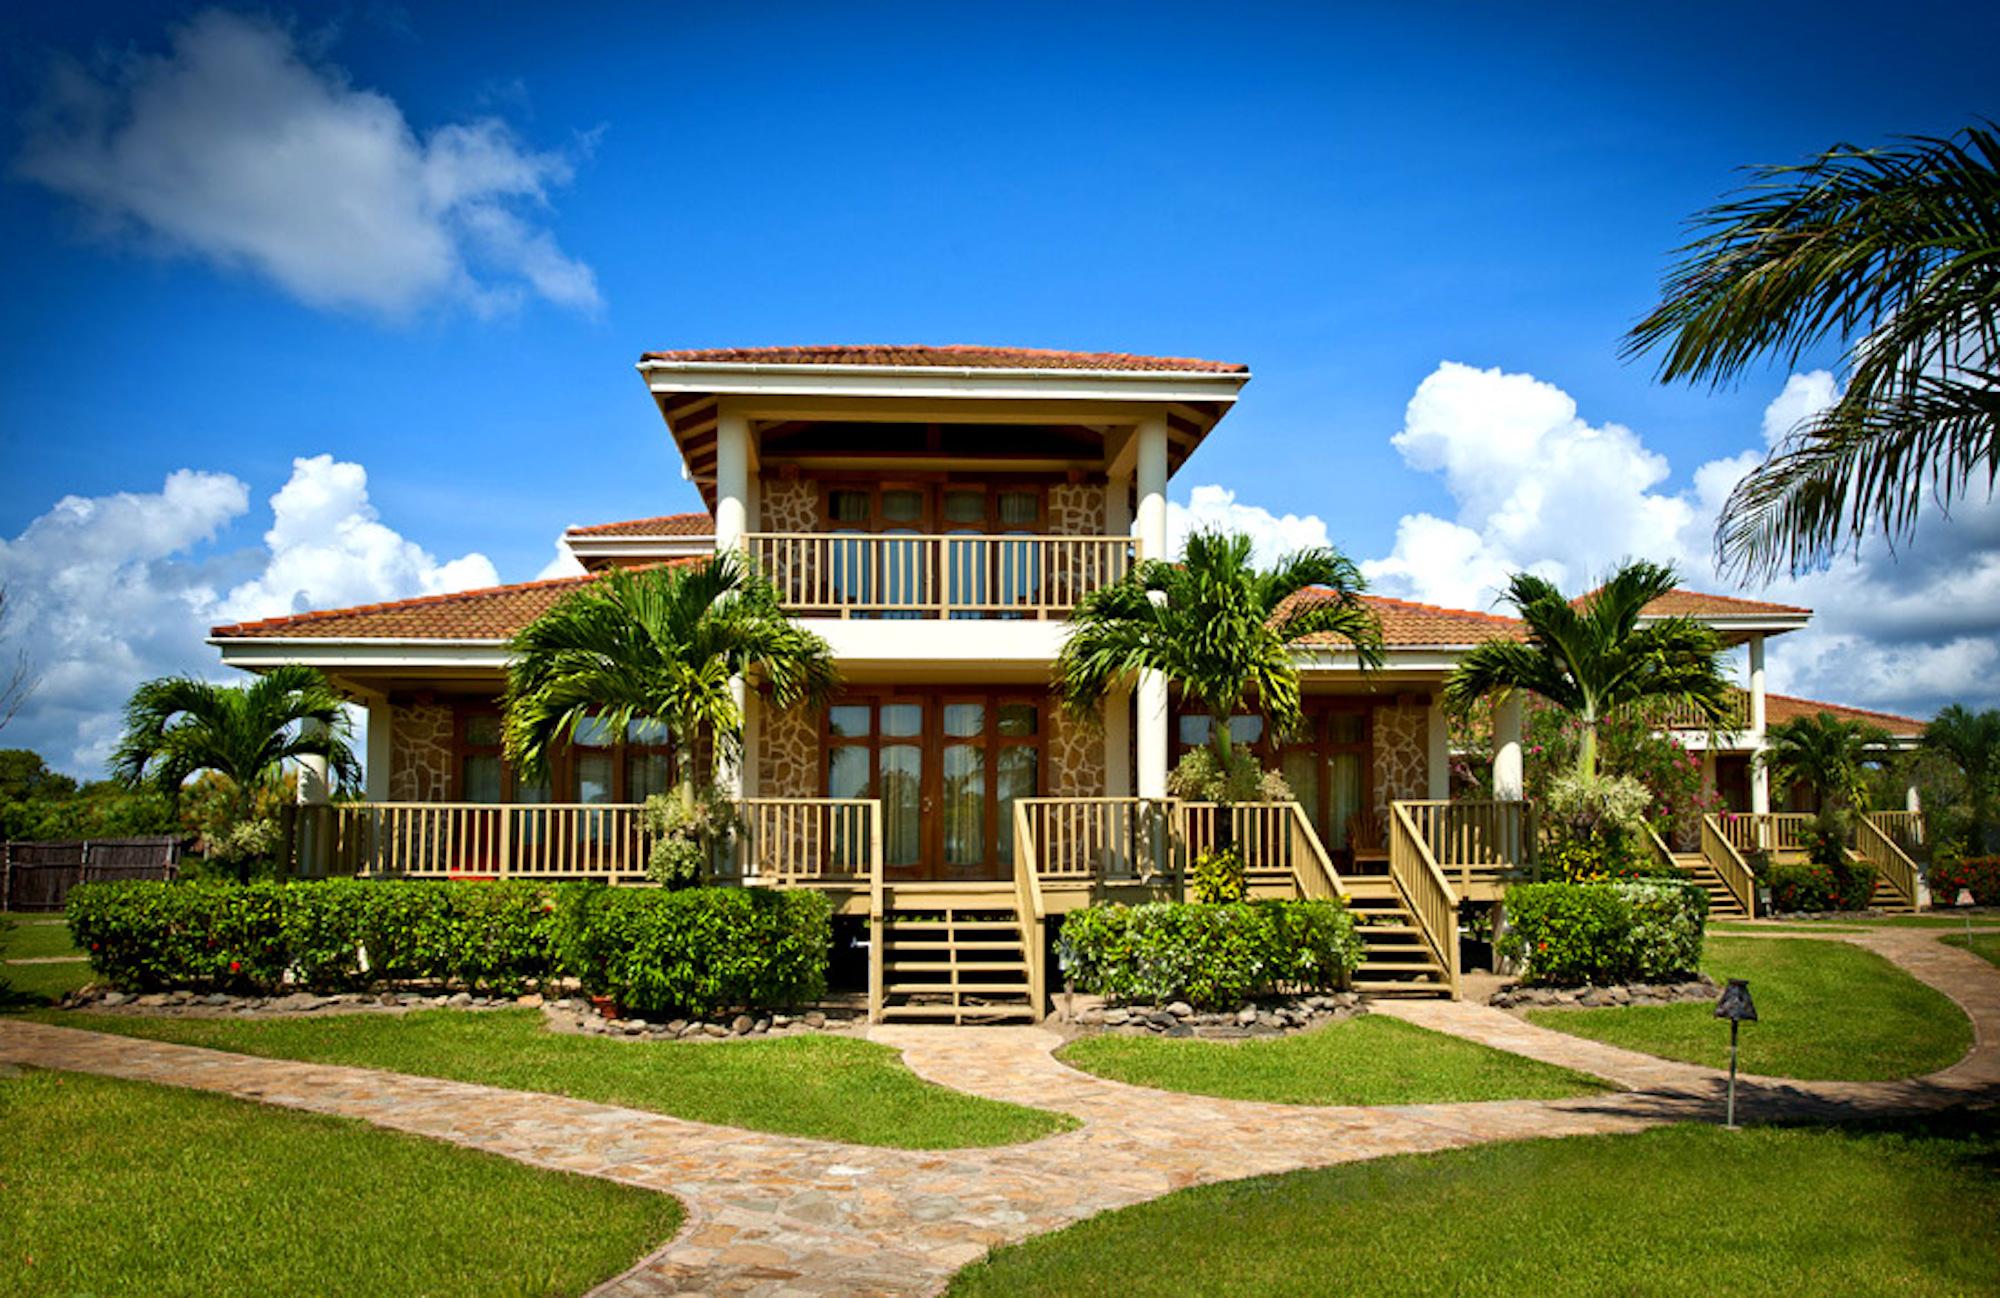 3-bedroom-beach-house.jpg